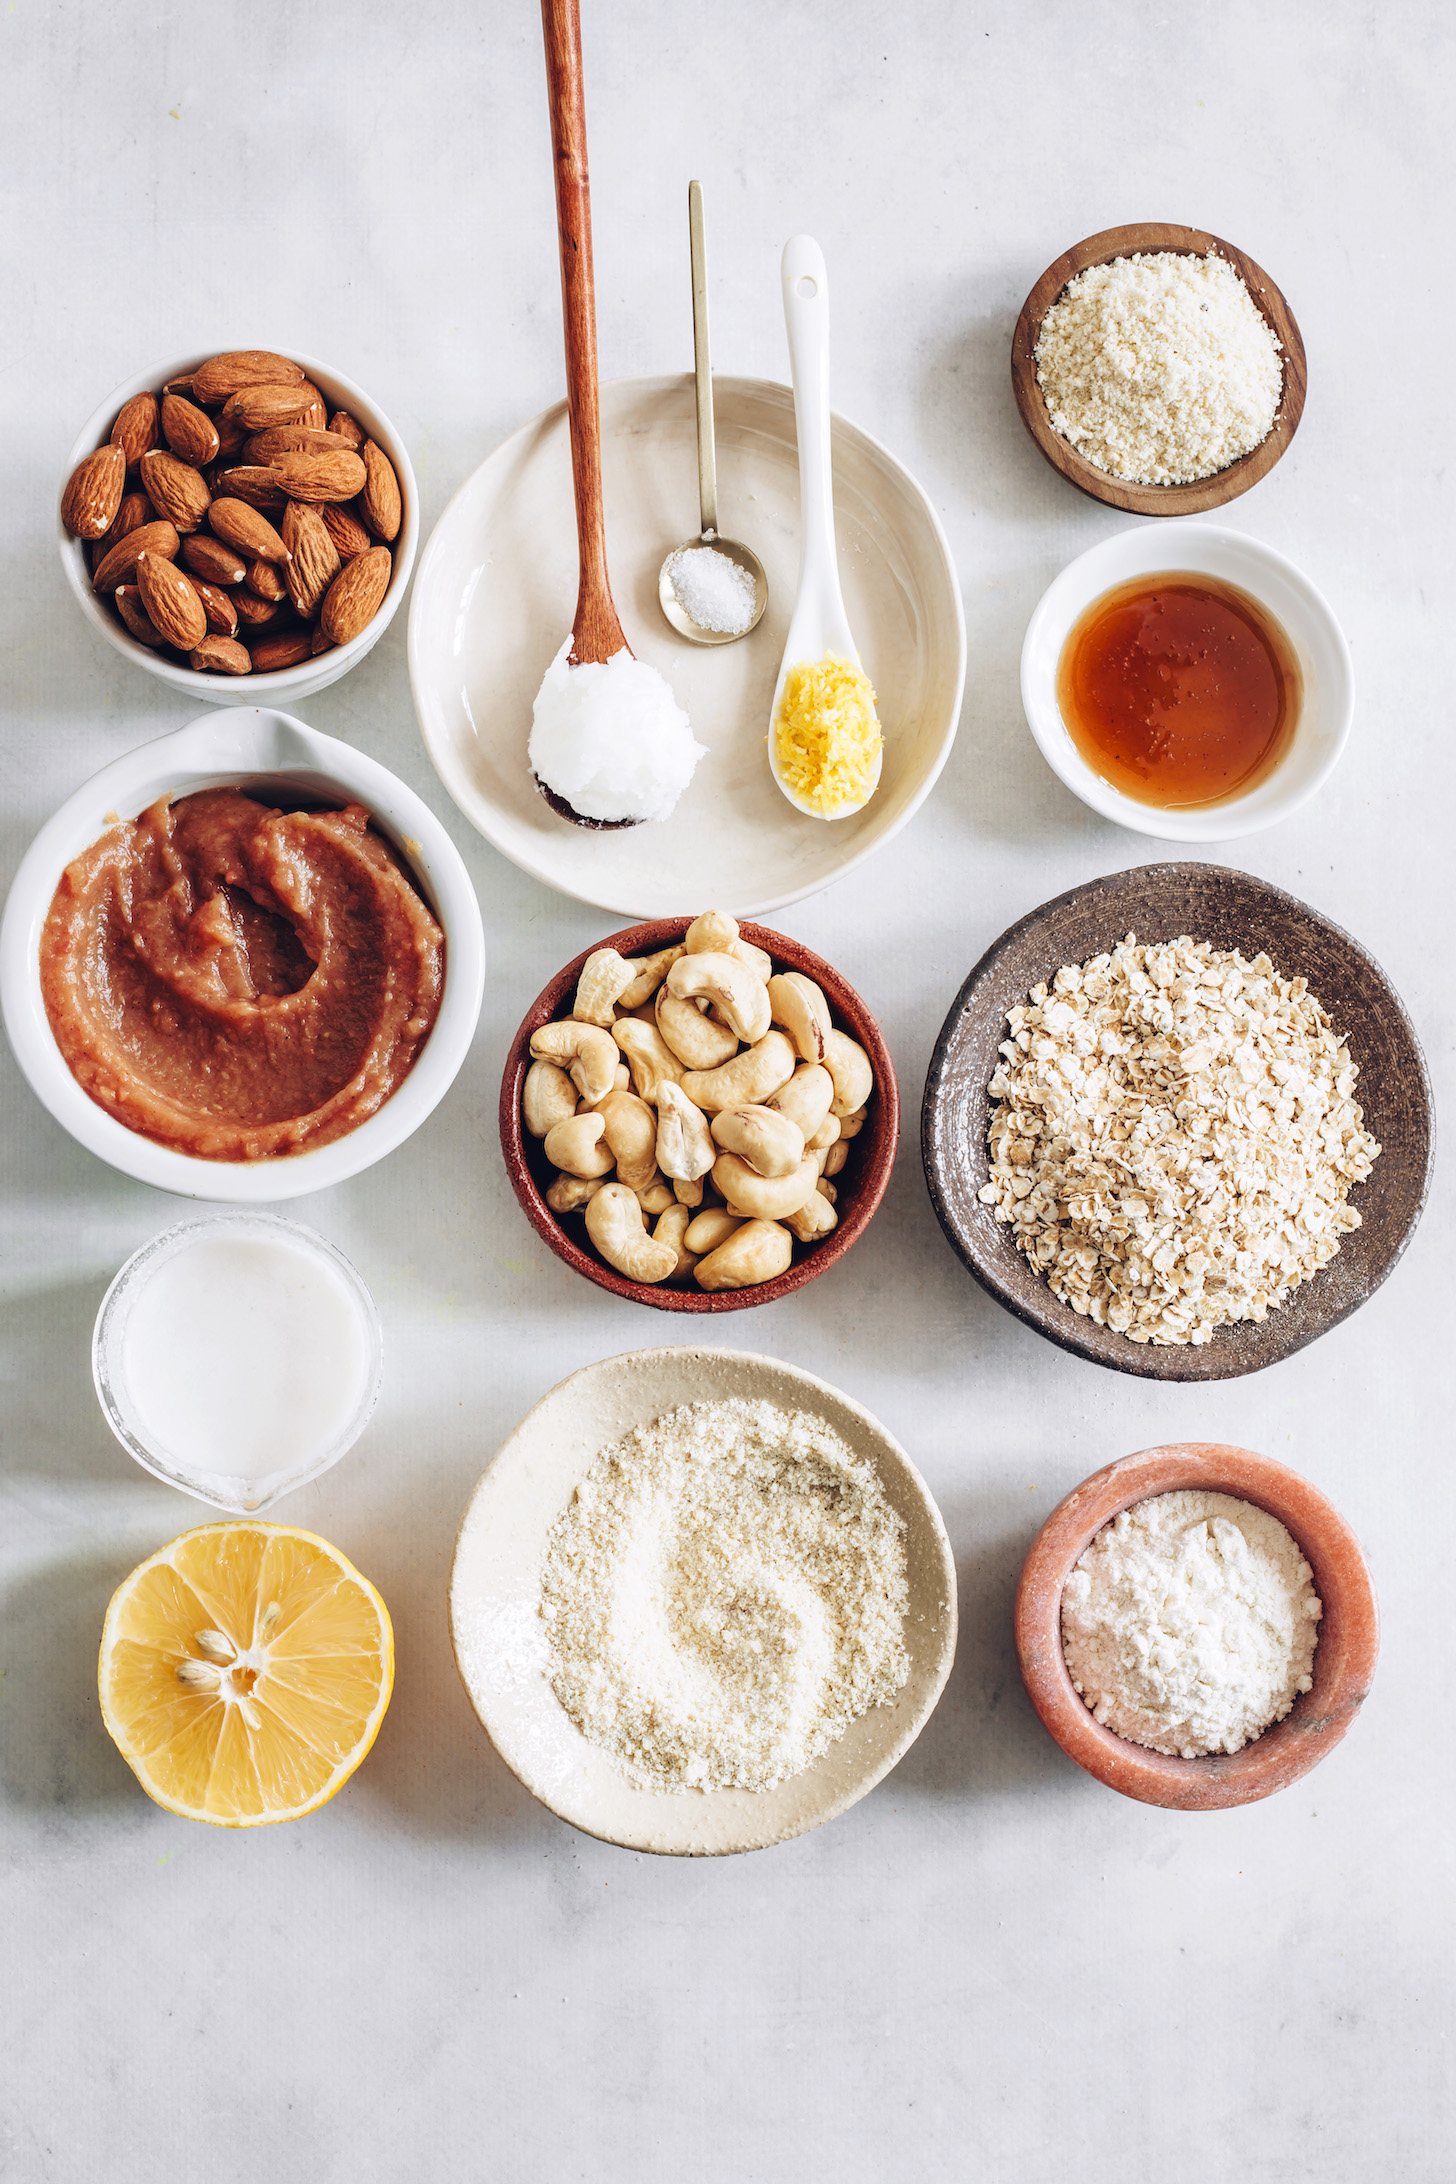 Almonds, apple butter, coconut cream, lemon, coconut oil, salt, cashews, almond flour, arrowroot starch, oats, and maple syrup